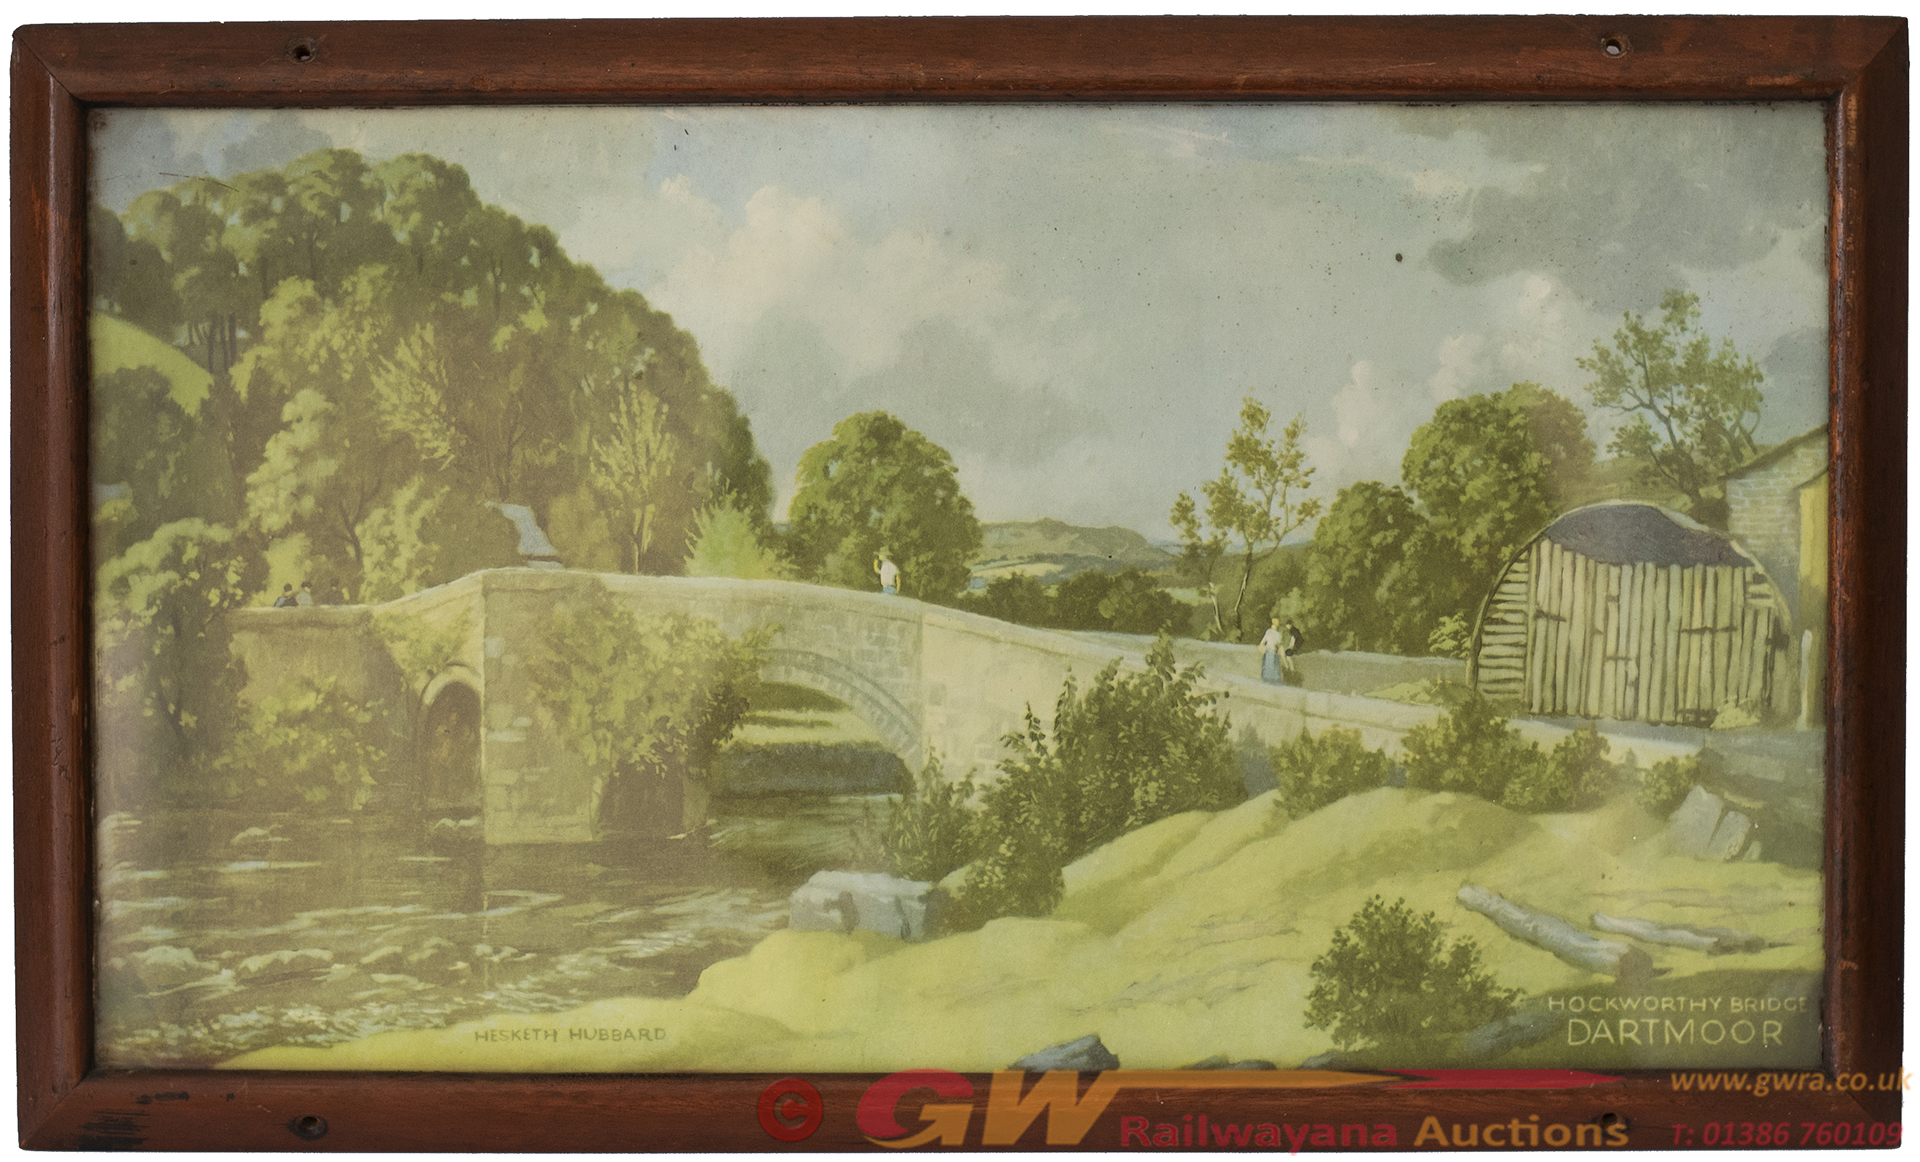 Carriage Print HOCKWORTHY BRIDGE DARTMOOR By